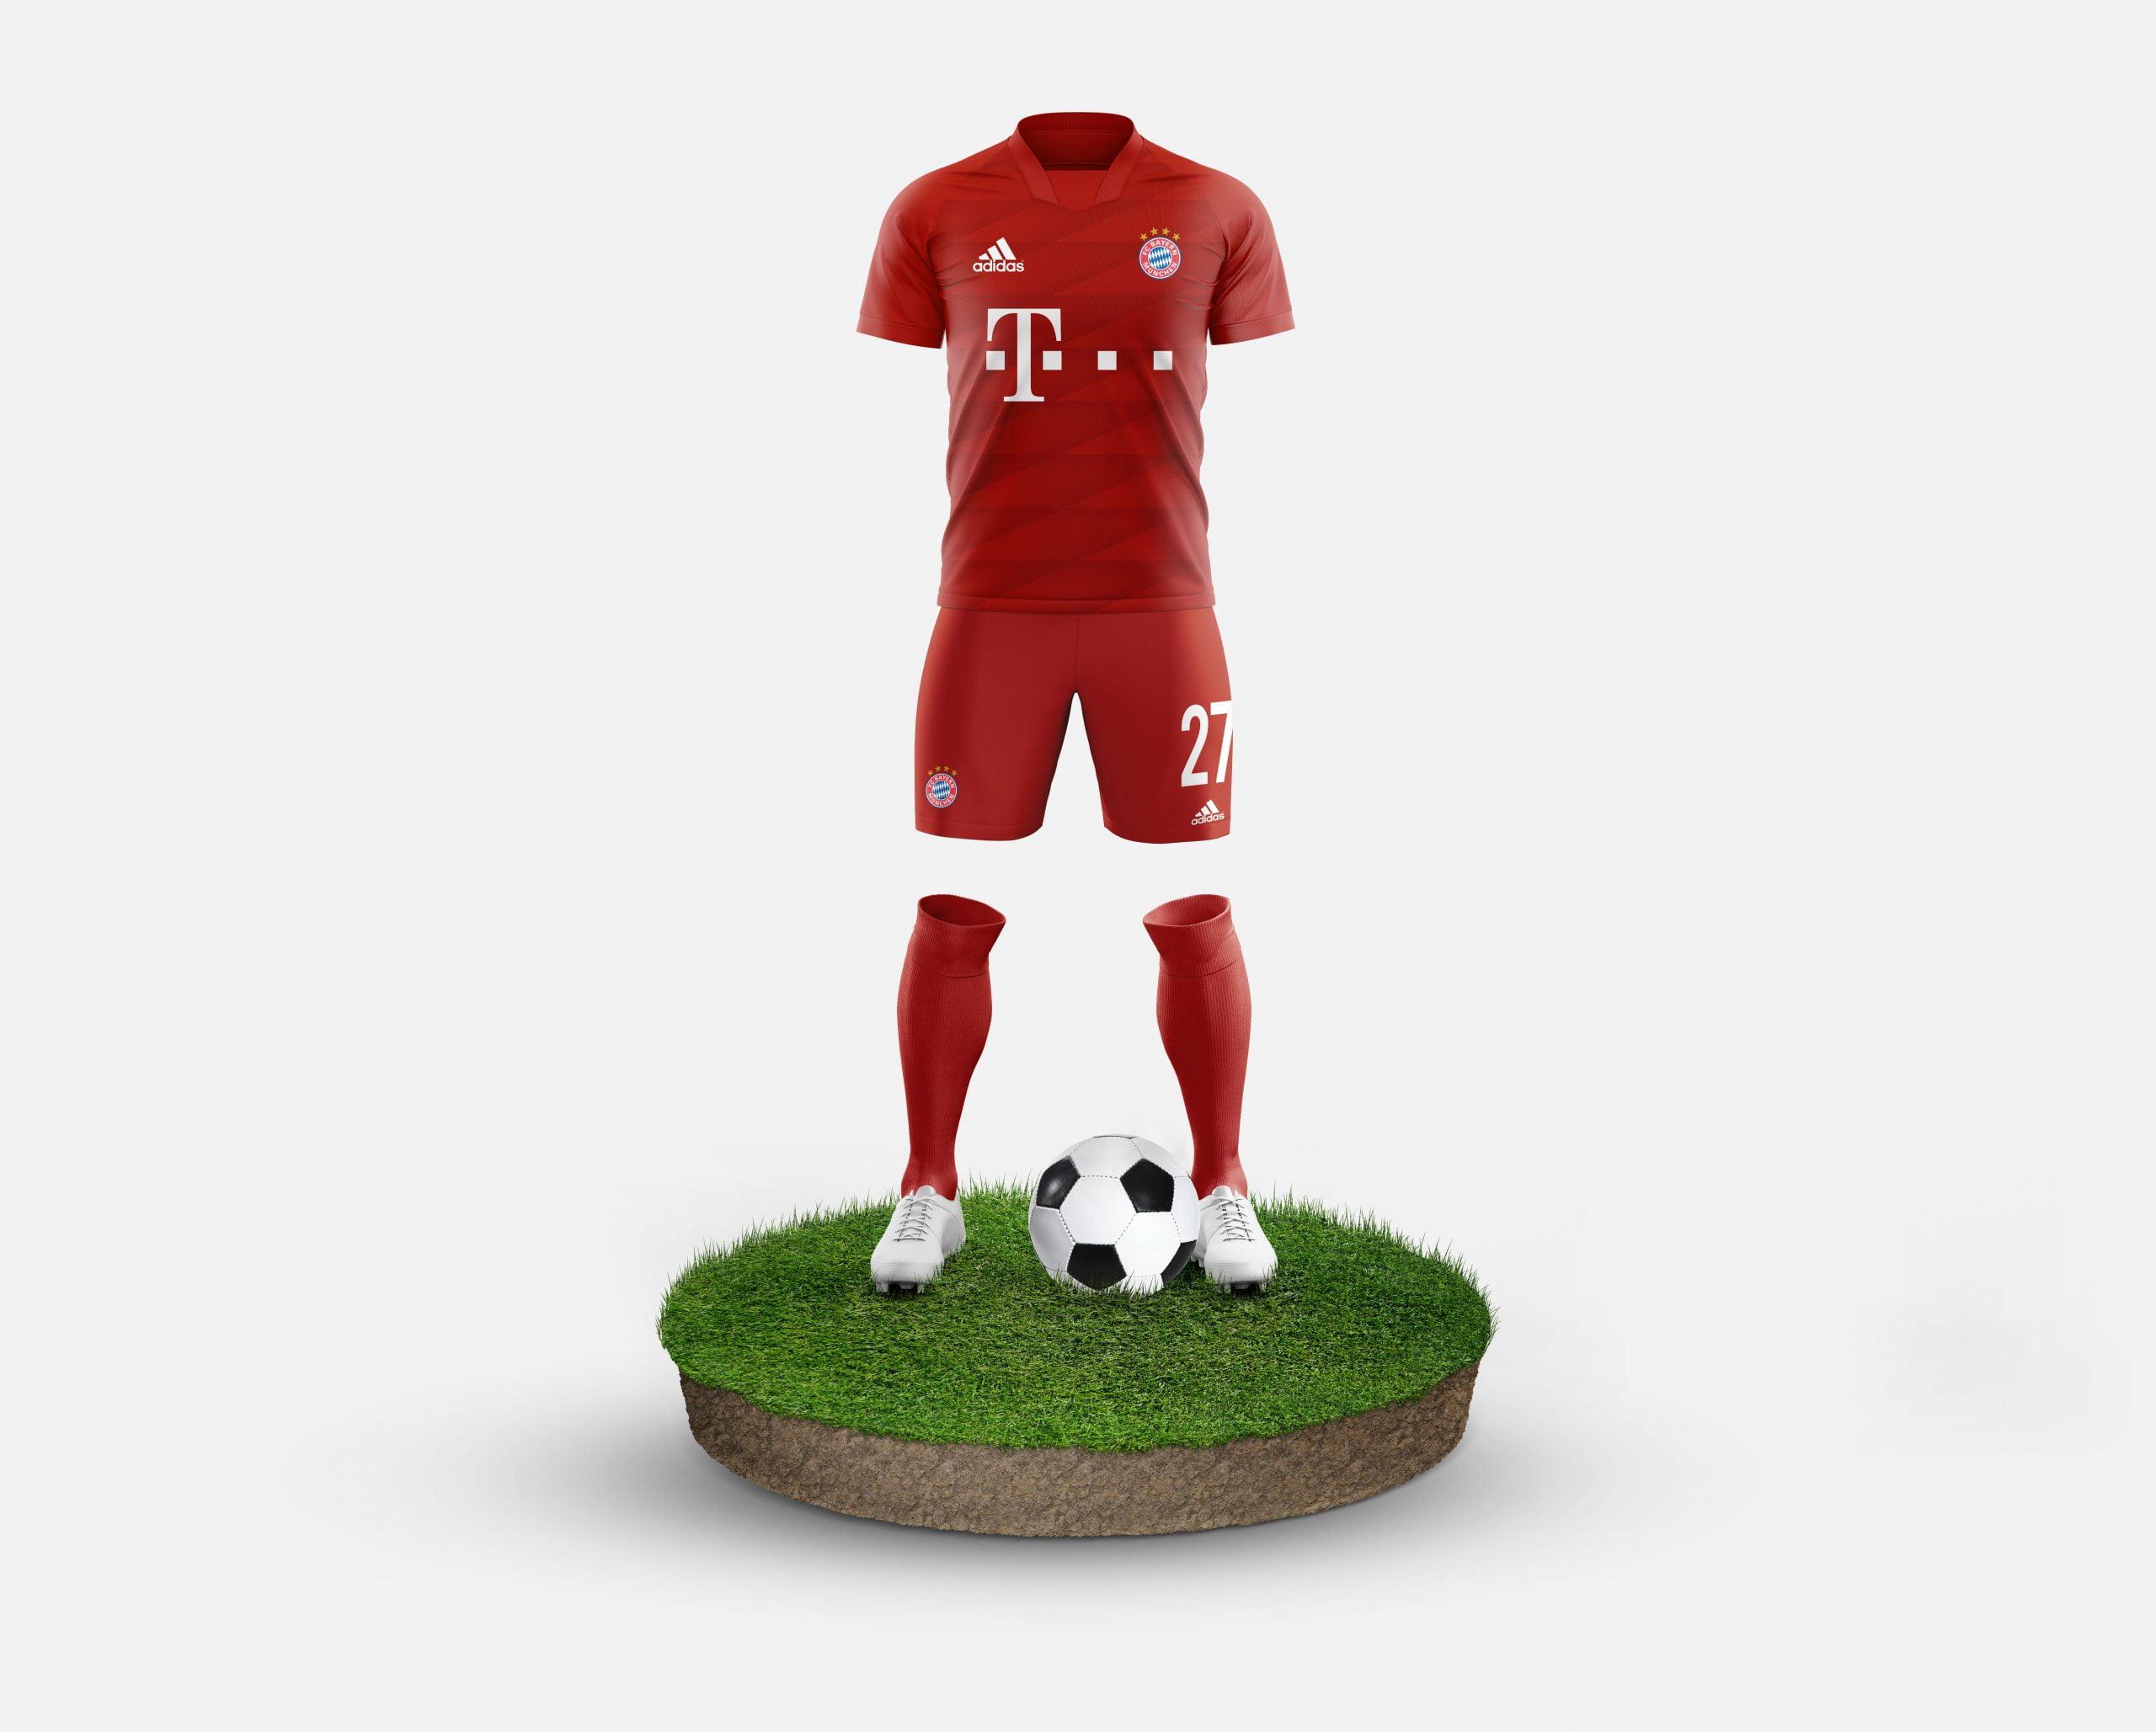 Bayern Munchen Free Football Kit Mockup Template